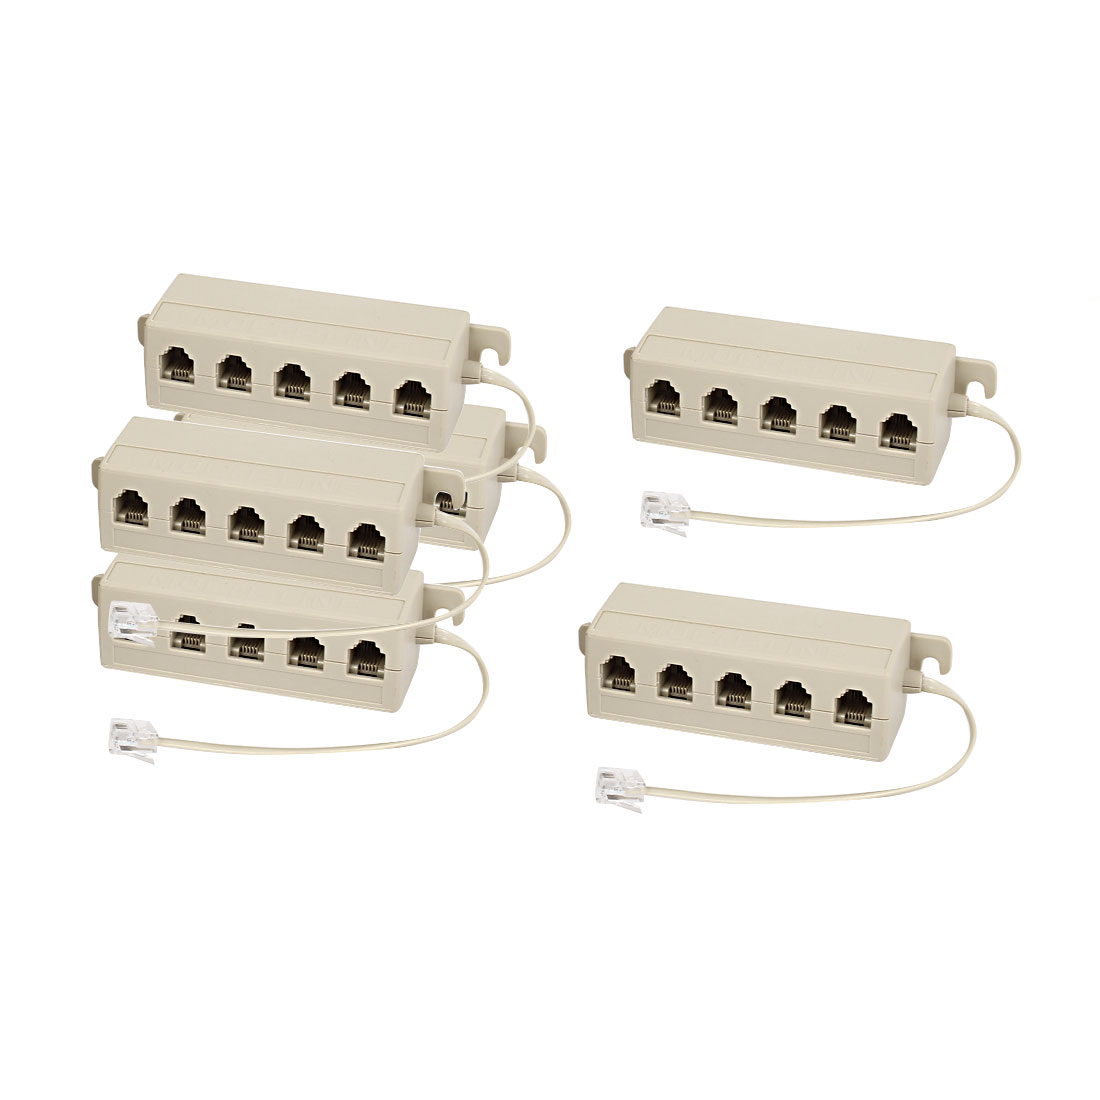 Unique Bargains RJ11 6P4C Male to 5 Male Telephone Phone Extension Connector Cable Splitter x6